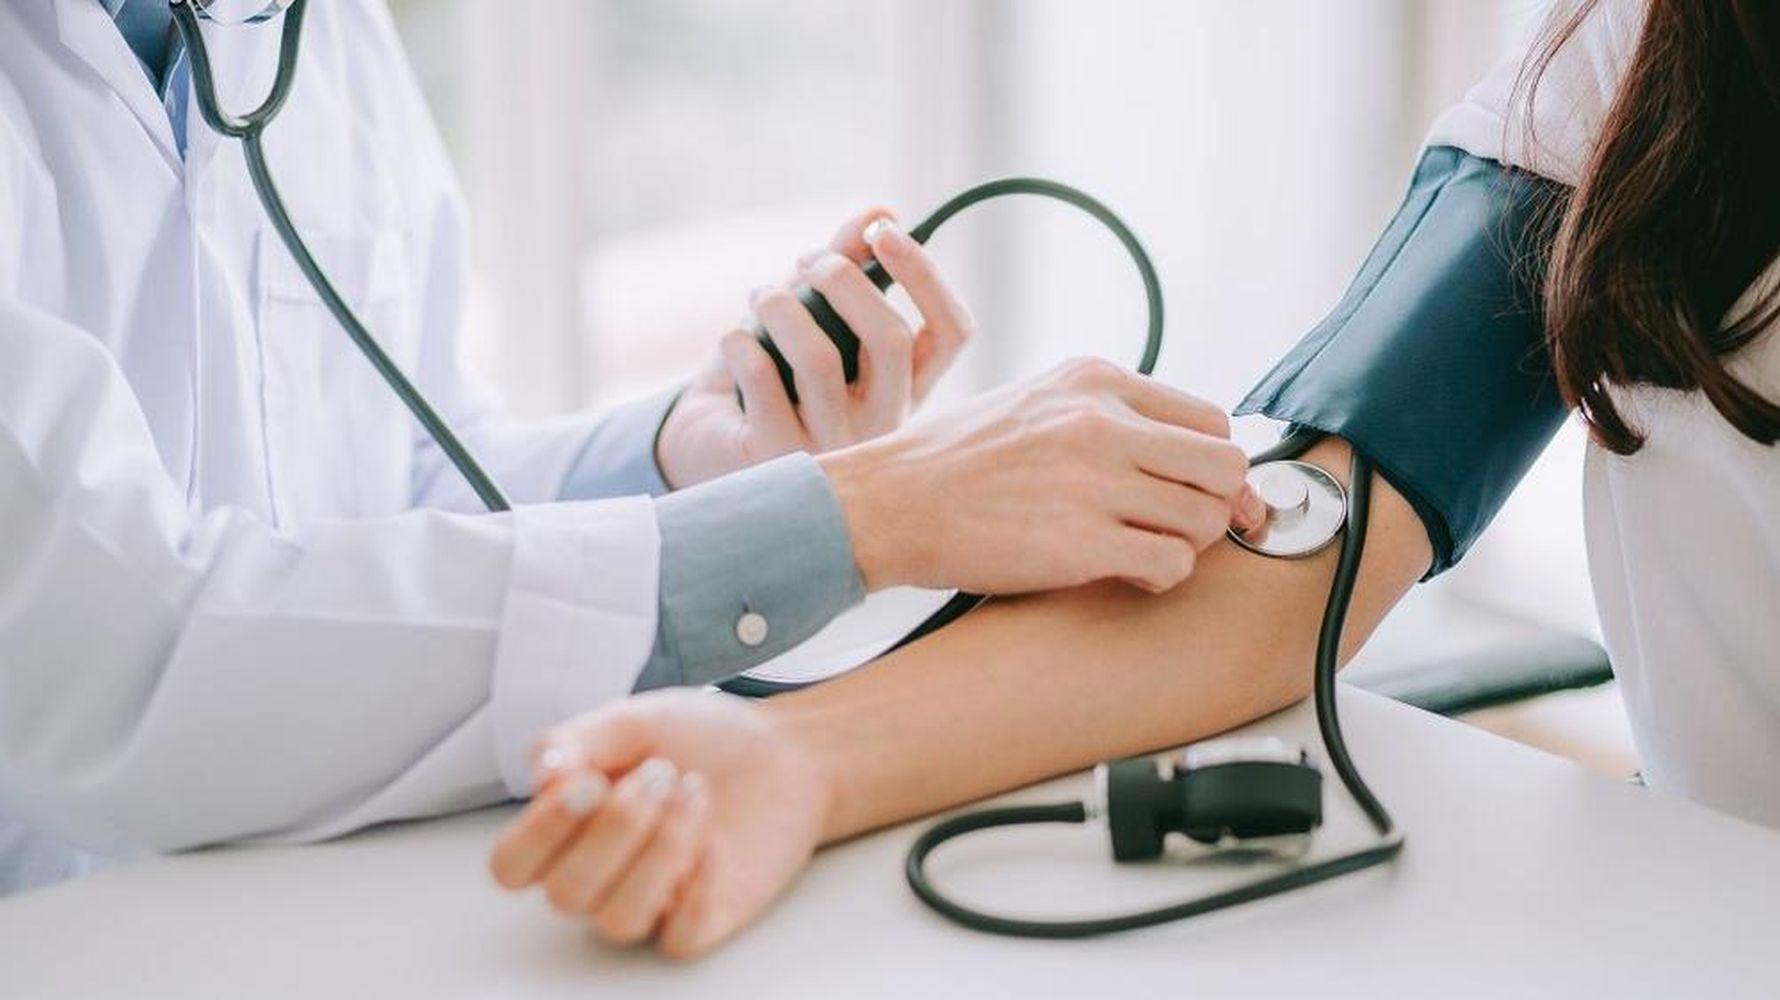 covid pandemic raises blood pressure